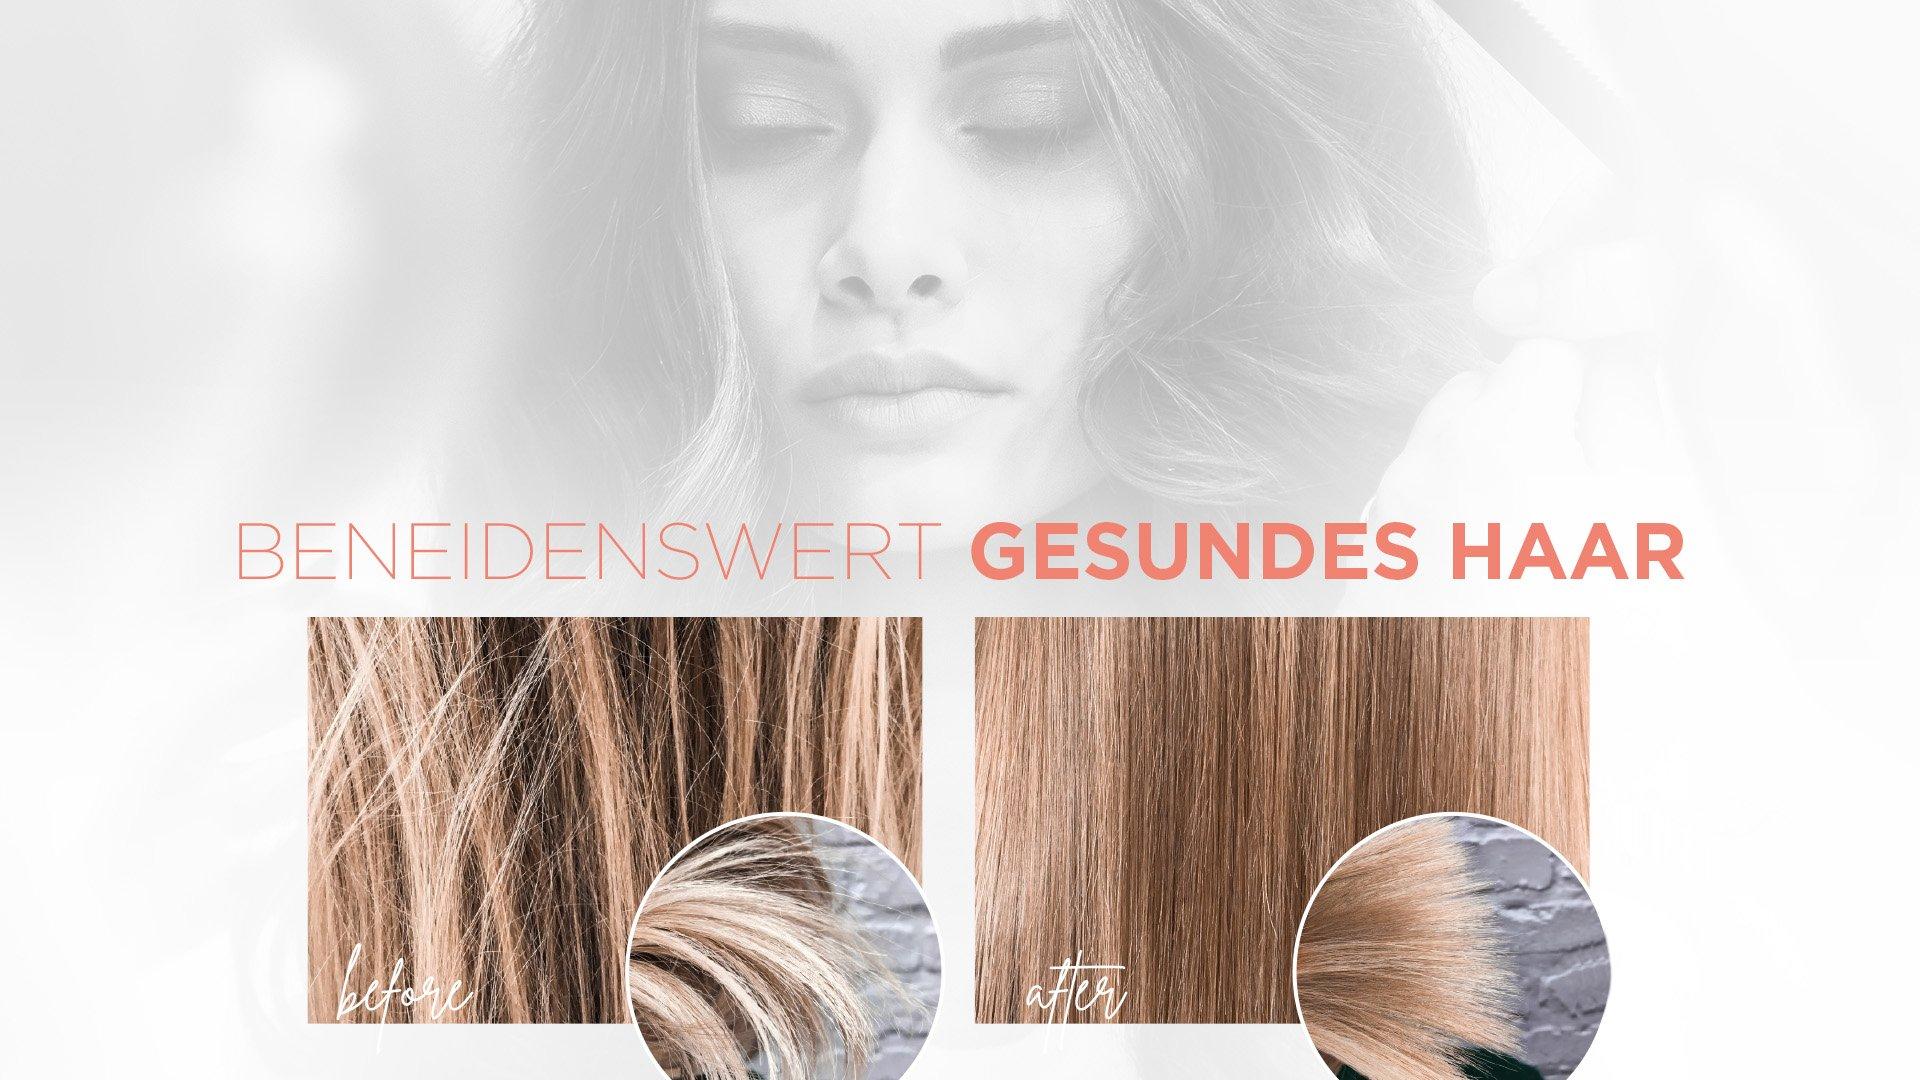 beauty's by christin - NEWSHA Haaraufbau Benefit 2 - Beauty's by Christin – Ihr Beautysalon in Delmenhorst